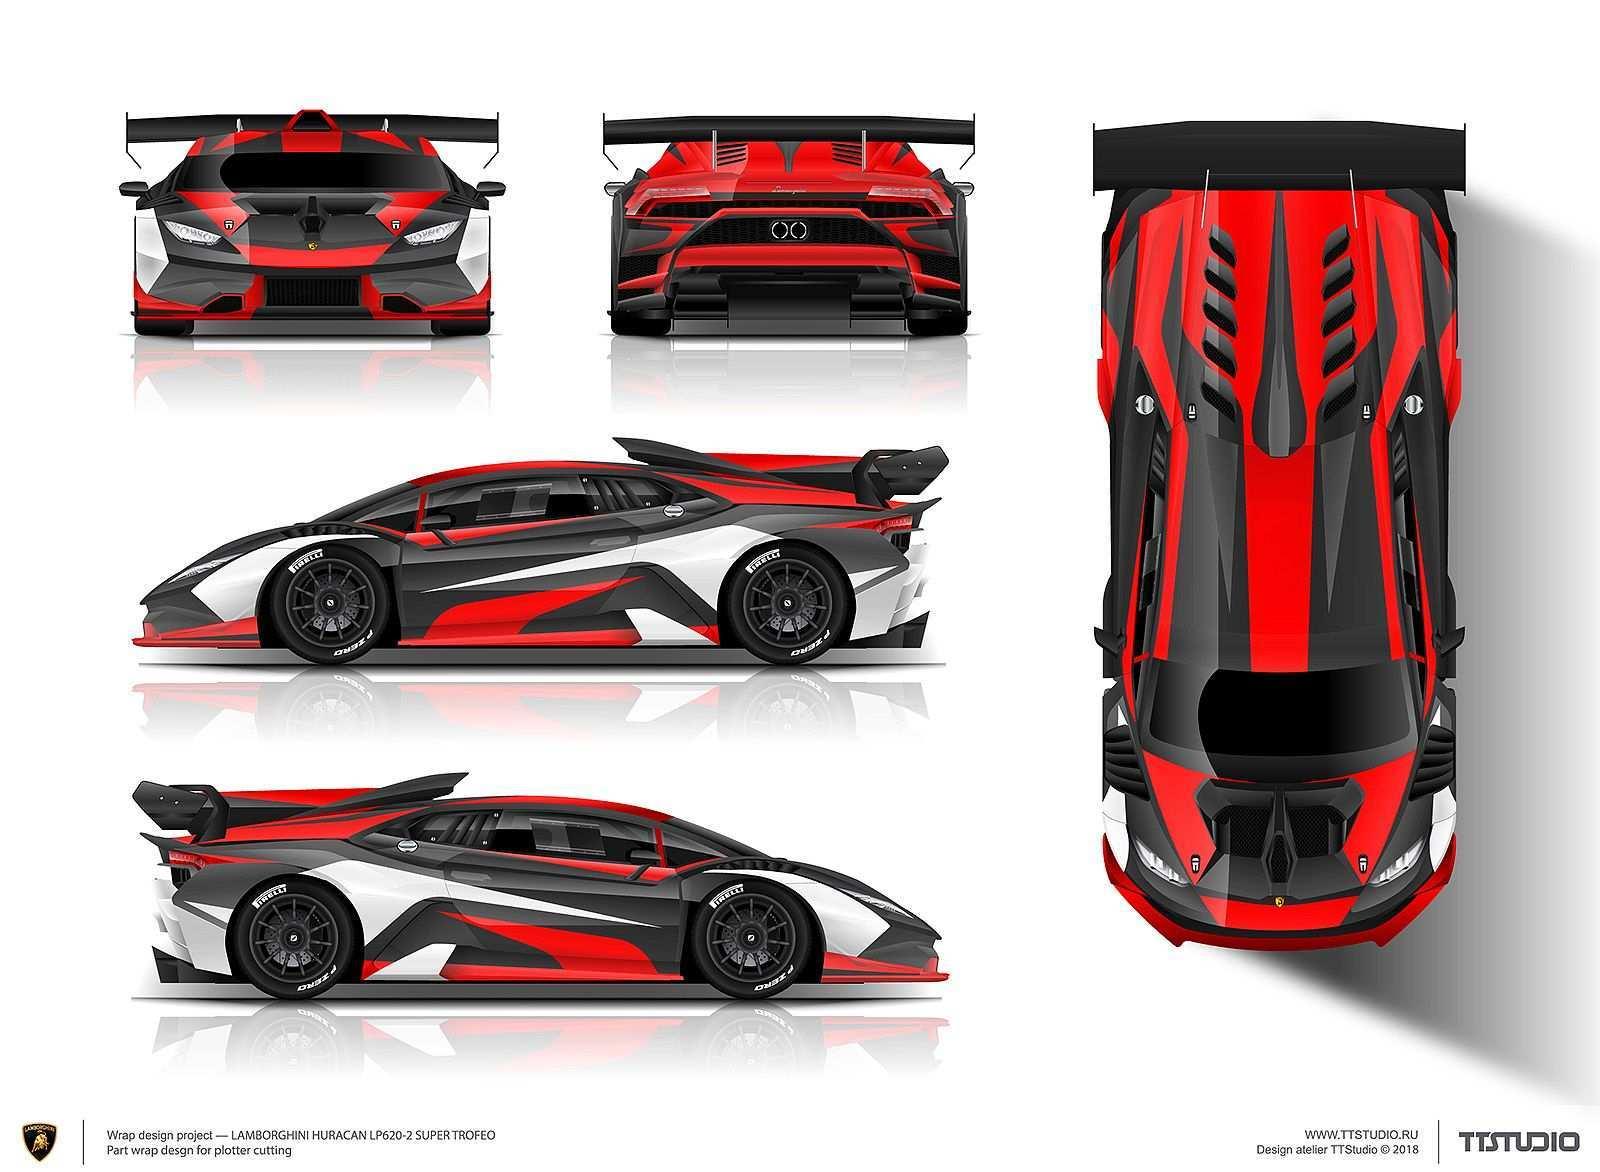 Idee Emballage De Voiture Au Decapeur The Approved Part Wrap Design Project For Lamborgh Car Wrap Car Wrap Design Lamborghini